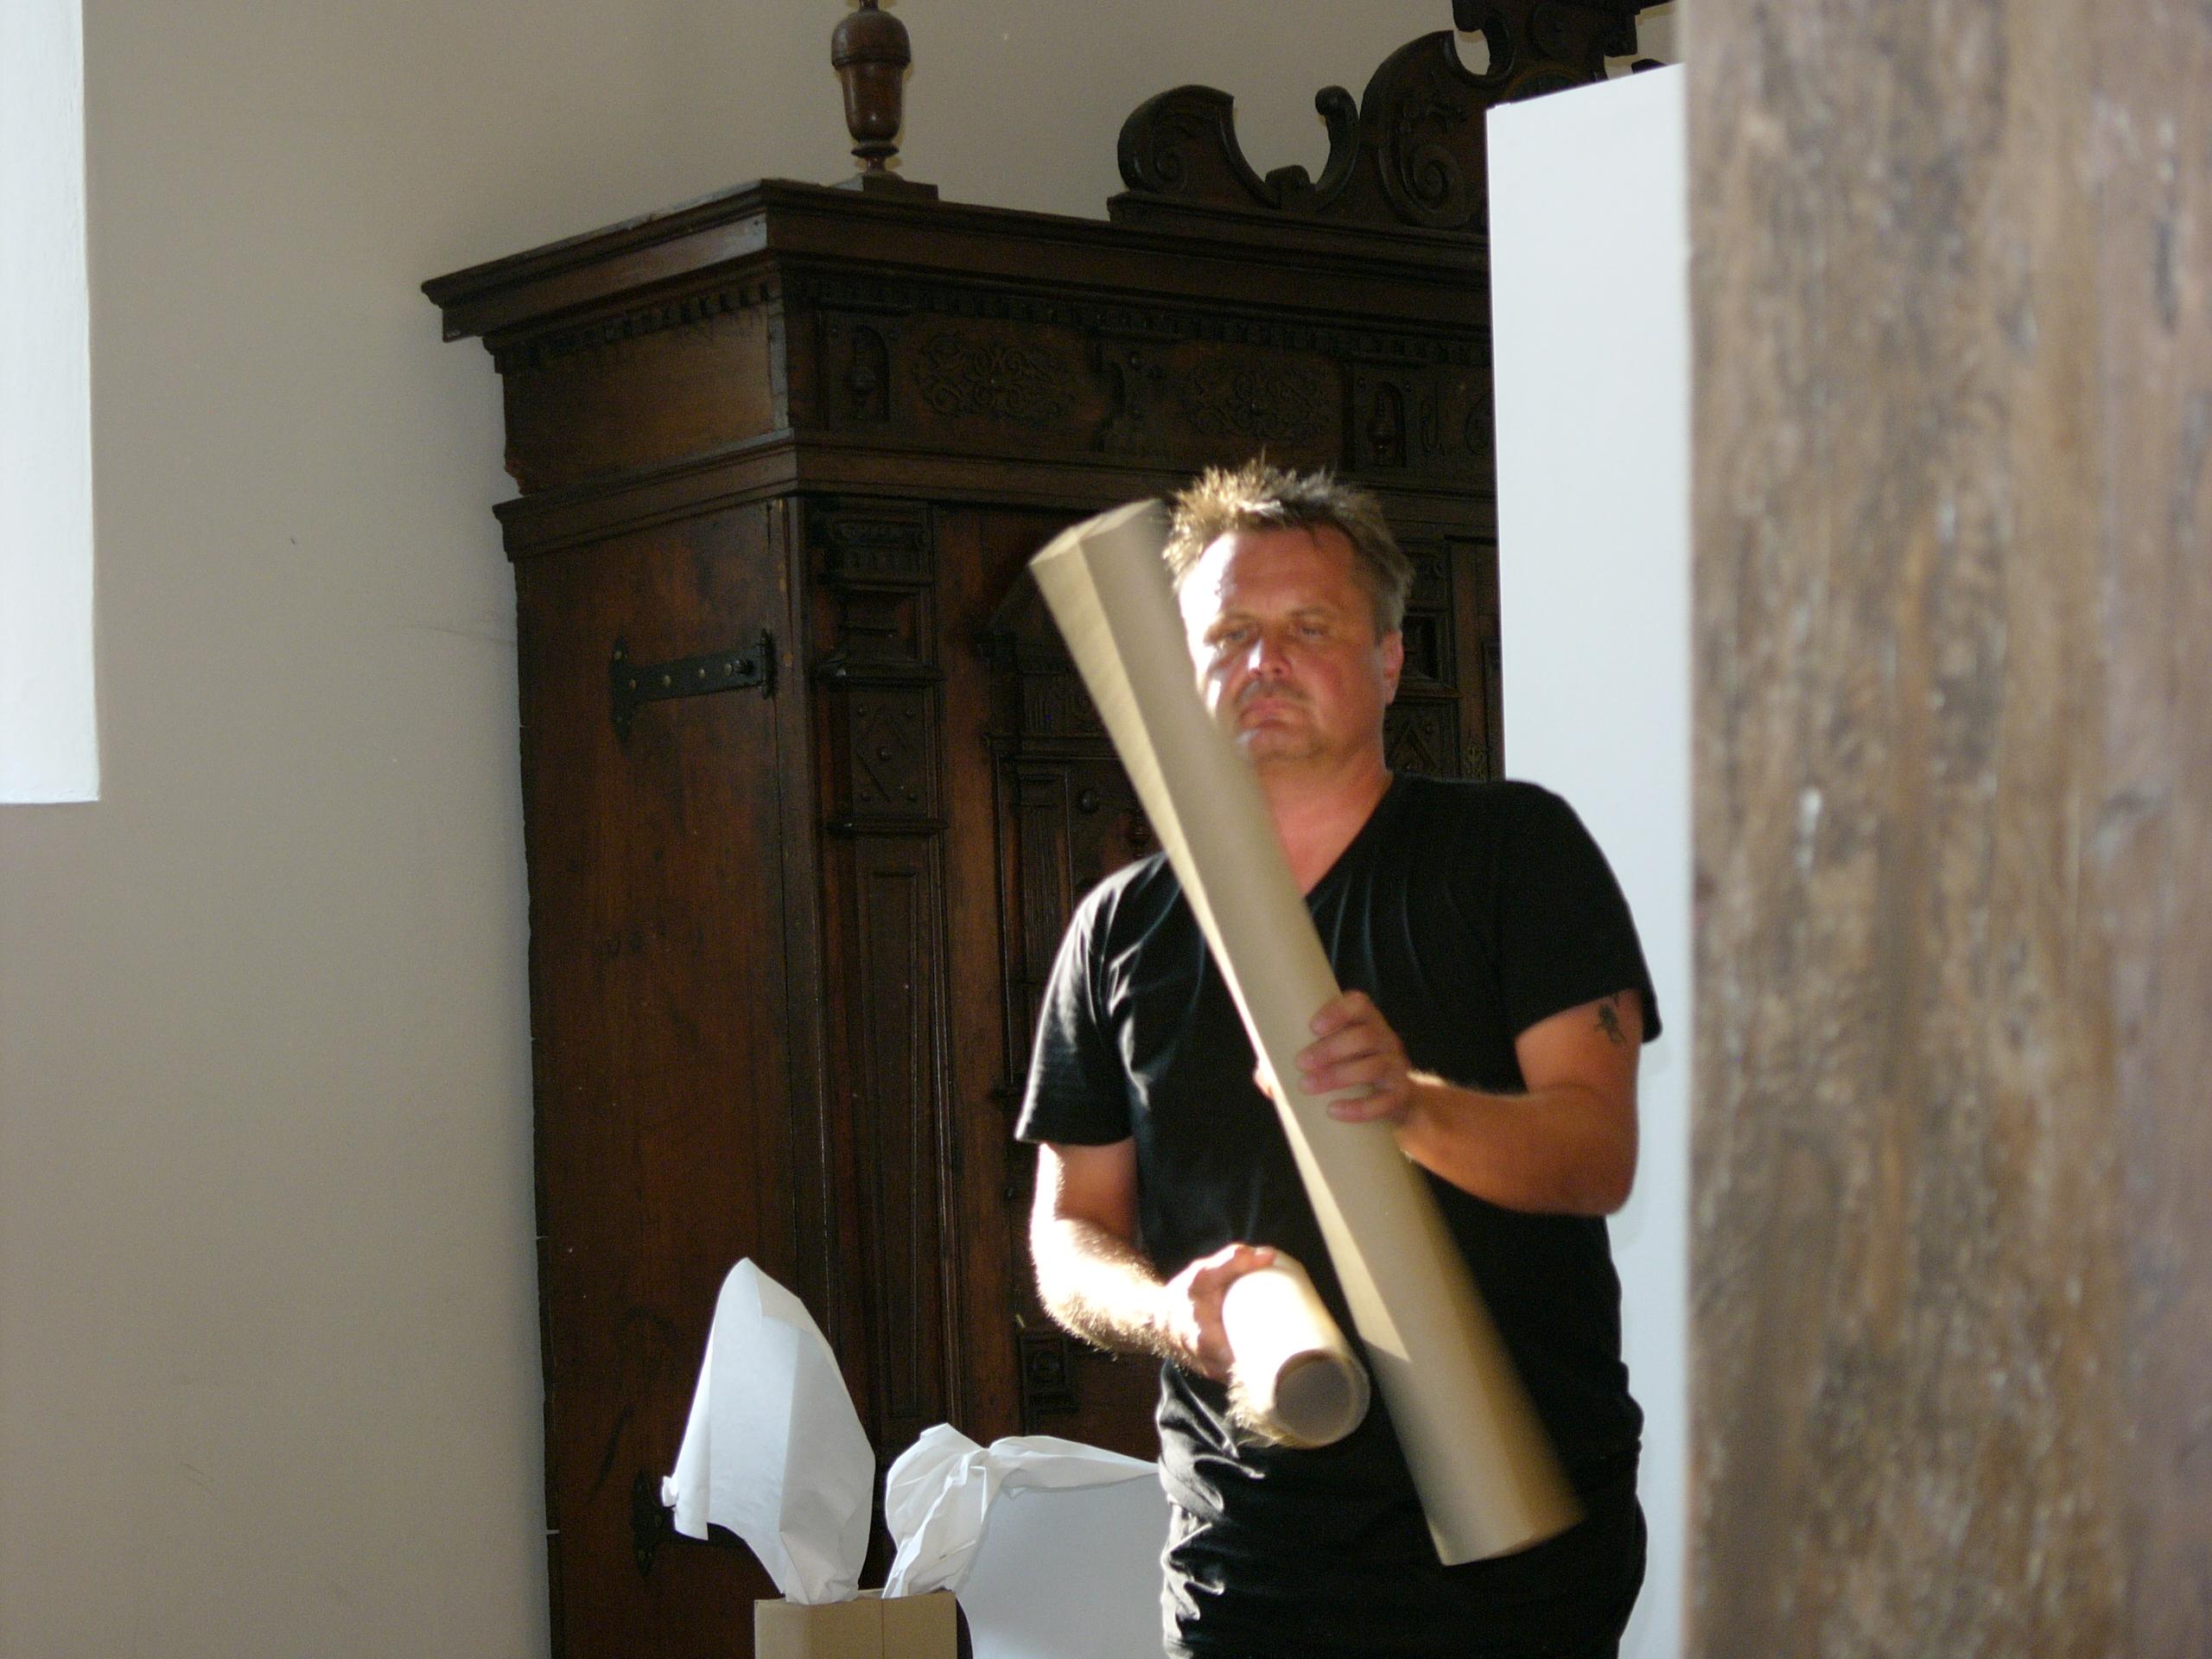 VielFaltPapier - Ausstellungseröffnung: Papiermusik: Viz Michael Kremietz